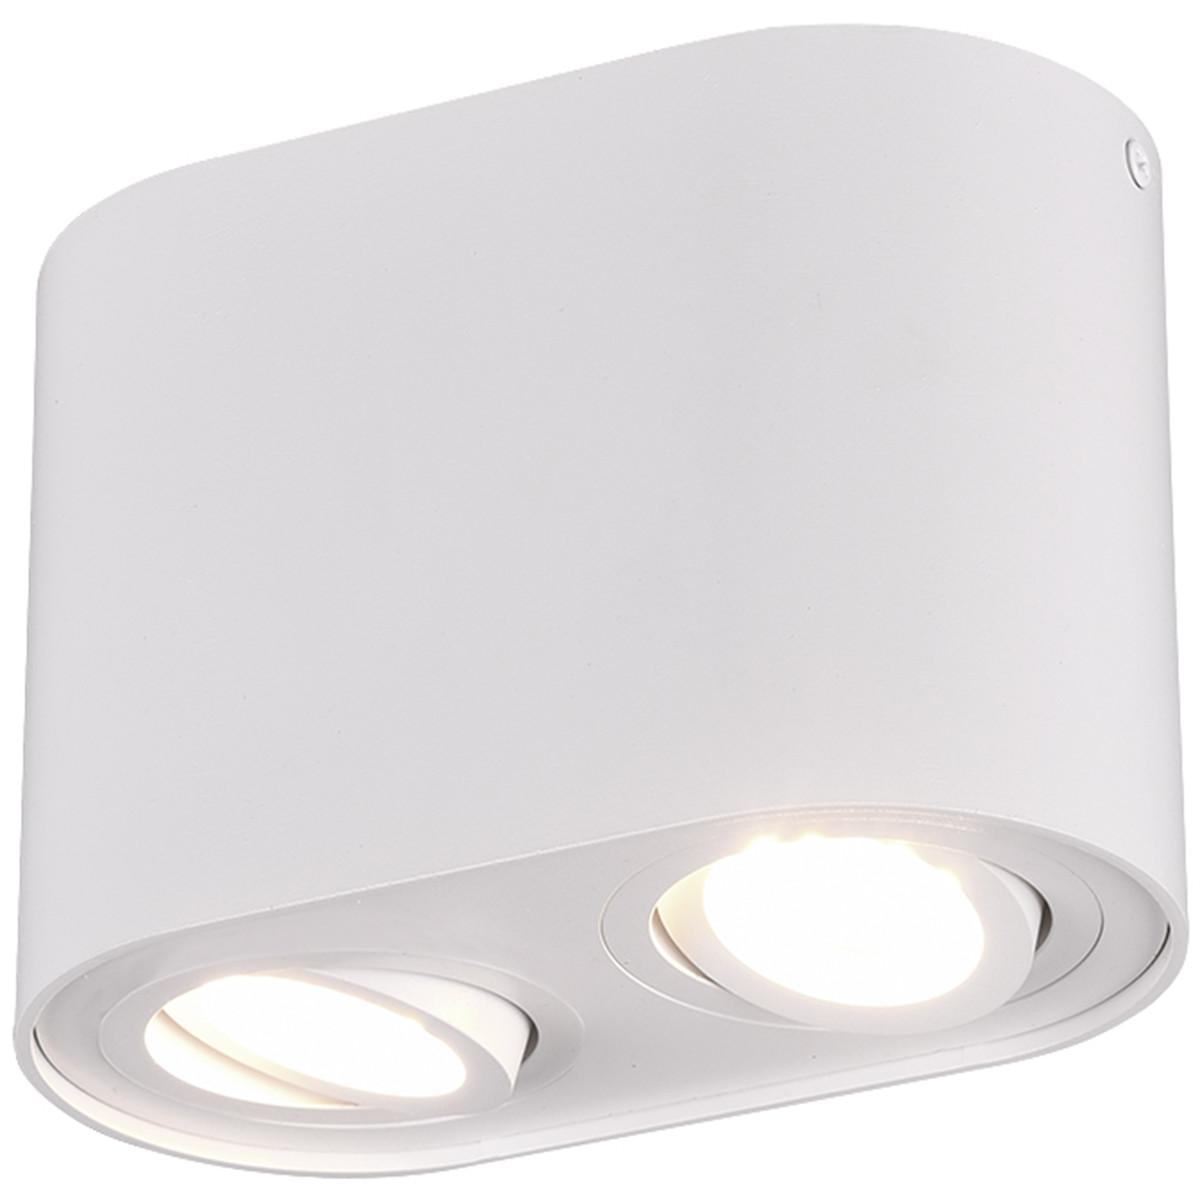 LED Plafondlamp - Plafondverlichting - Trion Cosmin - GU10 Fitting - 2-lichts - Rechthoek - Mat Wit